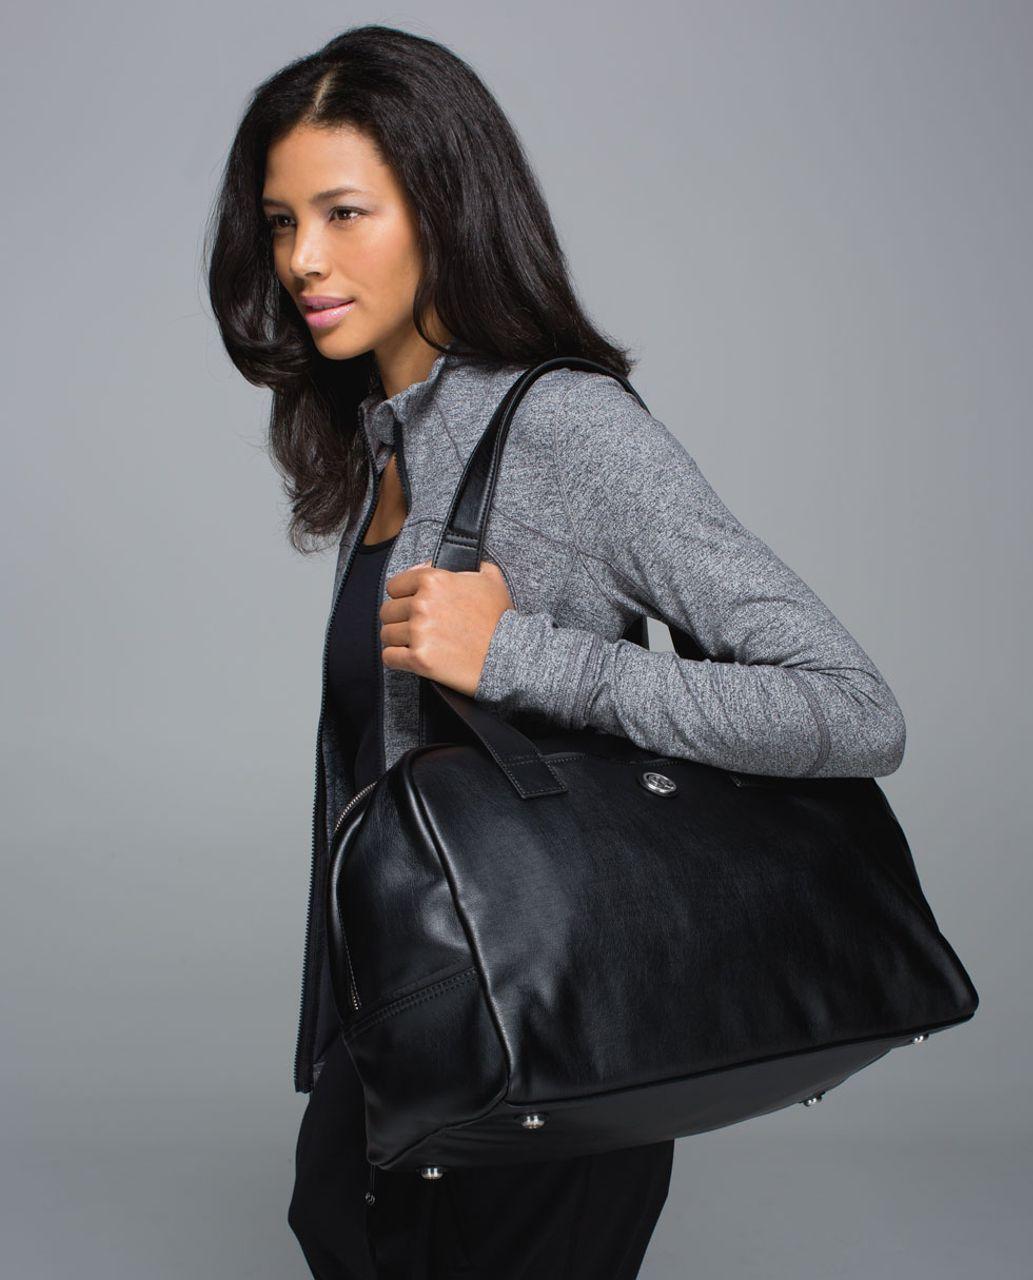 Lululemon Urban Sanctuary Bag (First Release) - Black